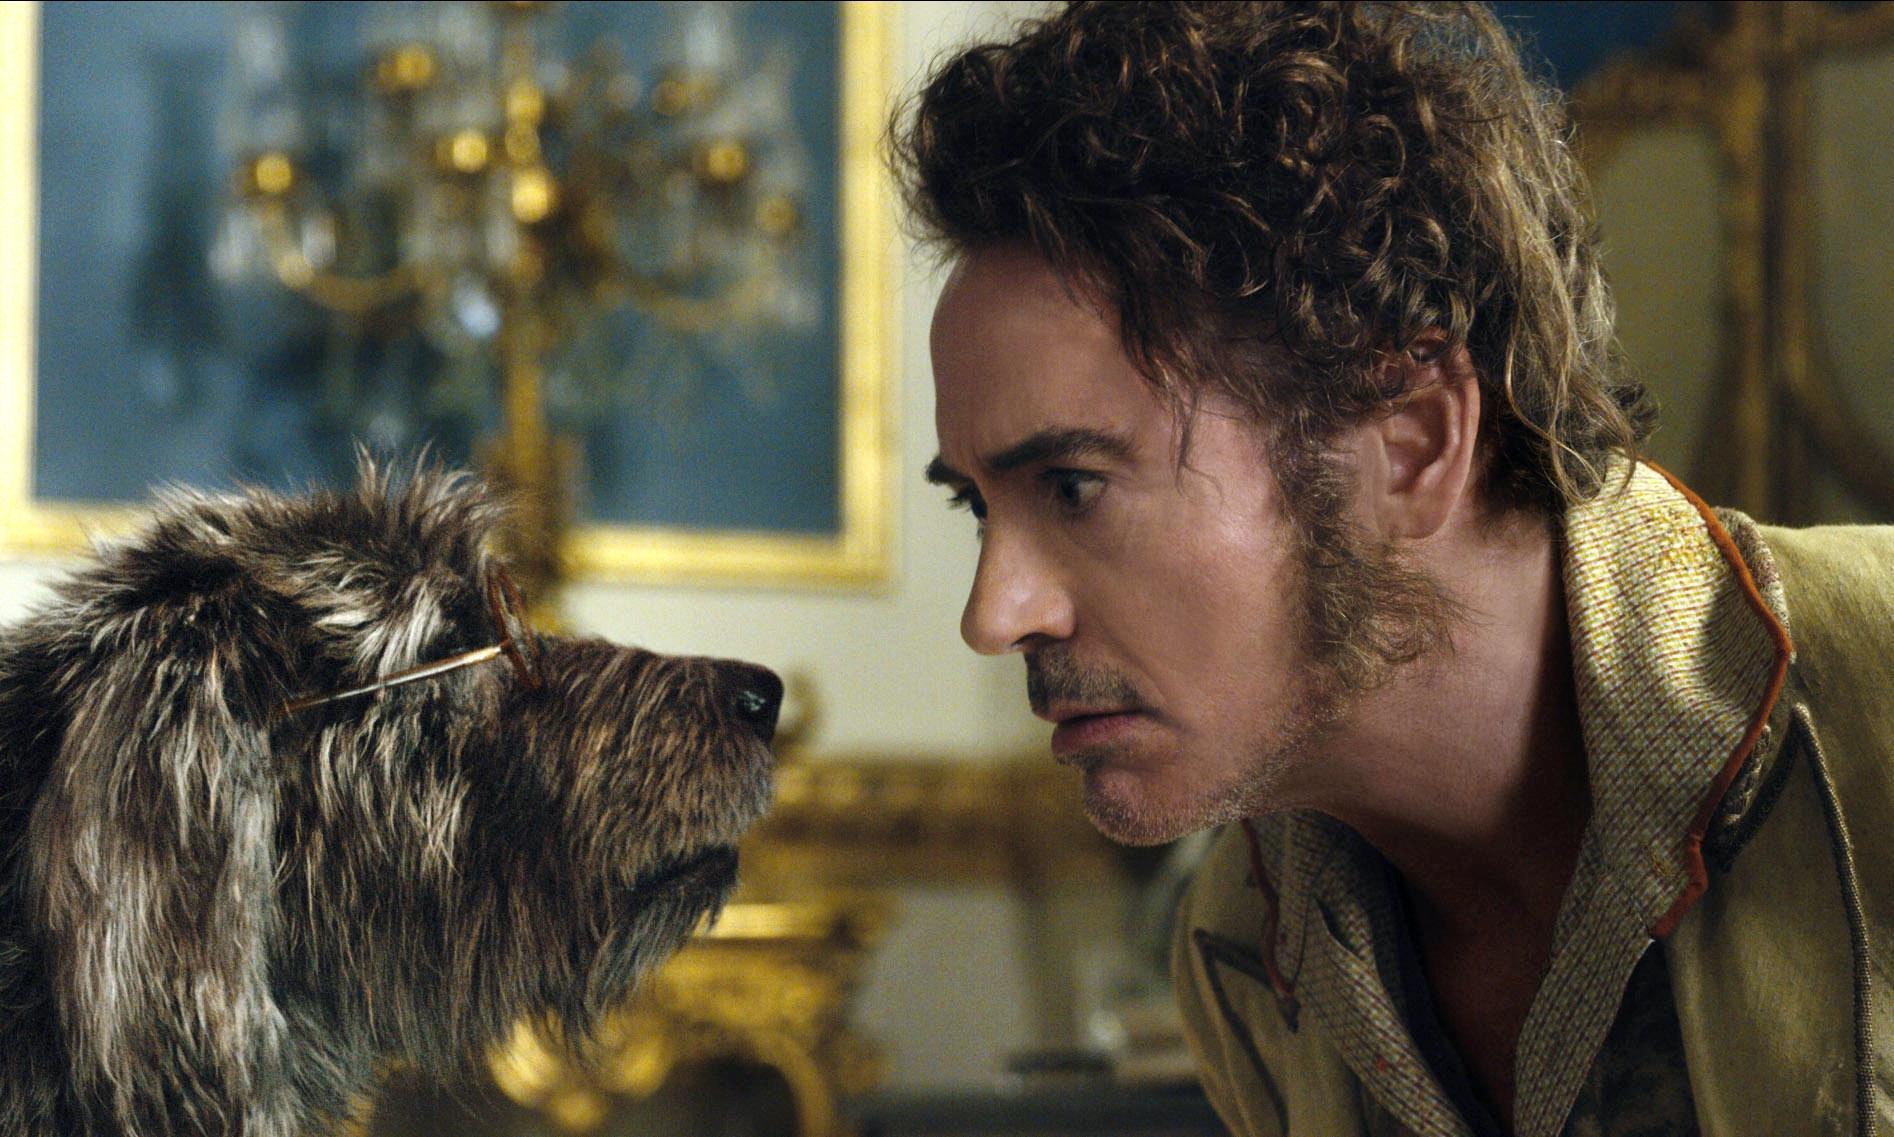 Dolittle review – Robert Downey Jr's middling talking-animals pantomime